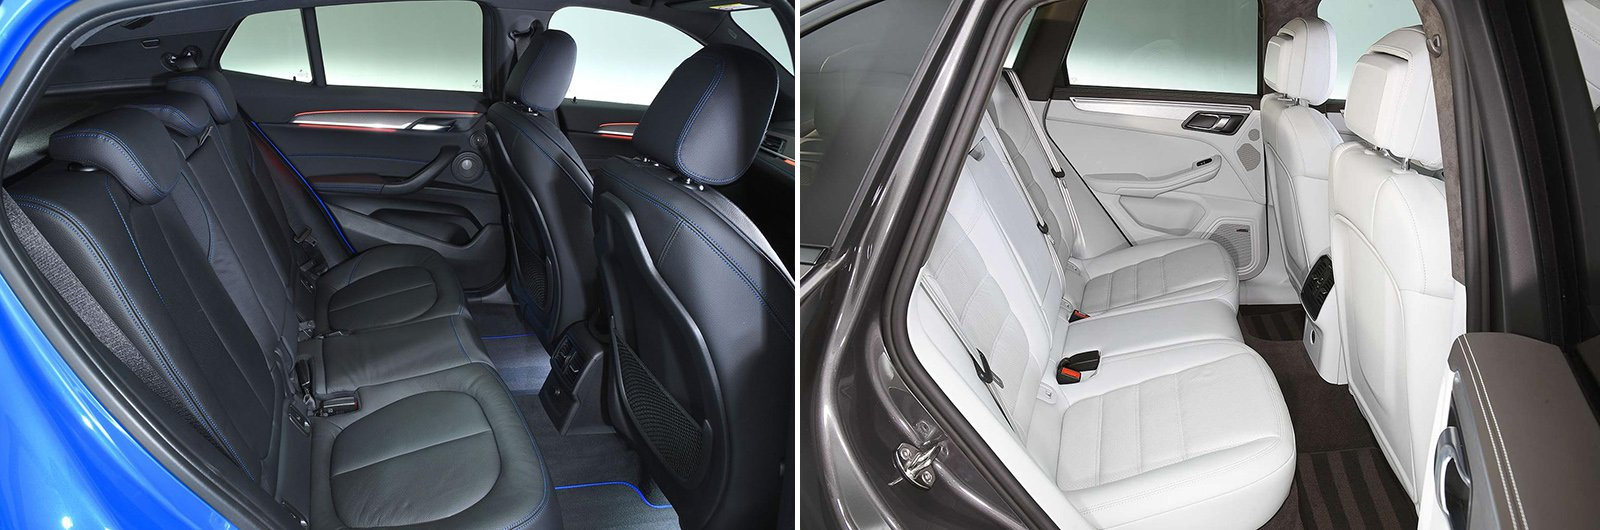 New BMW X2 vs used Porsche Macan – rear seat